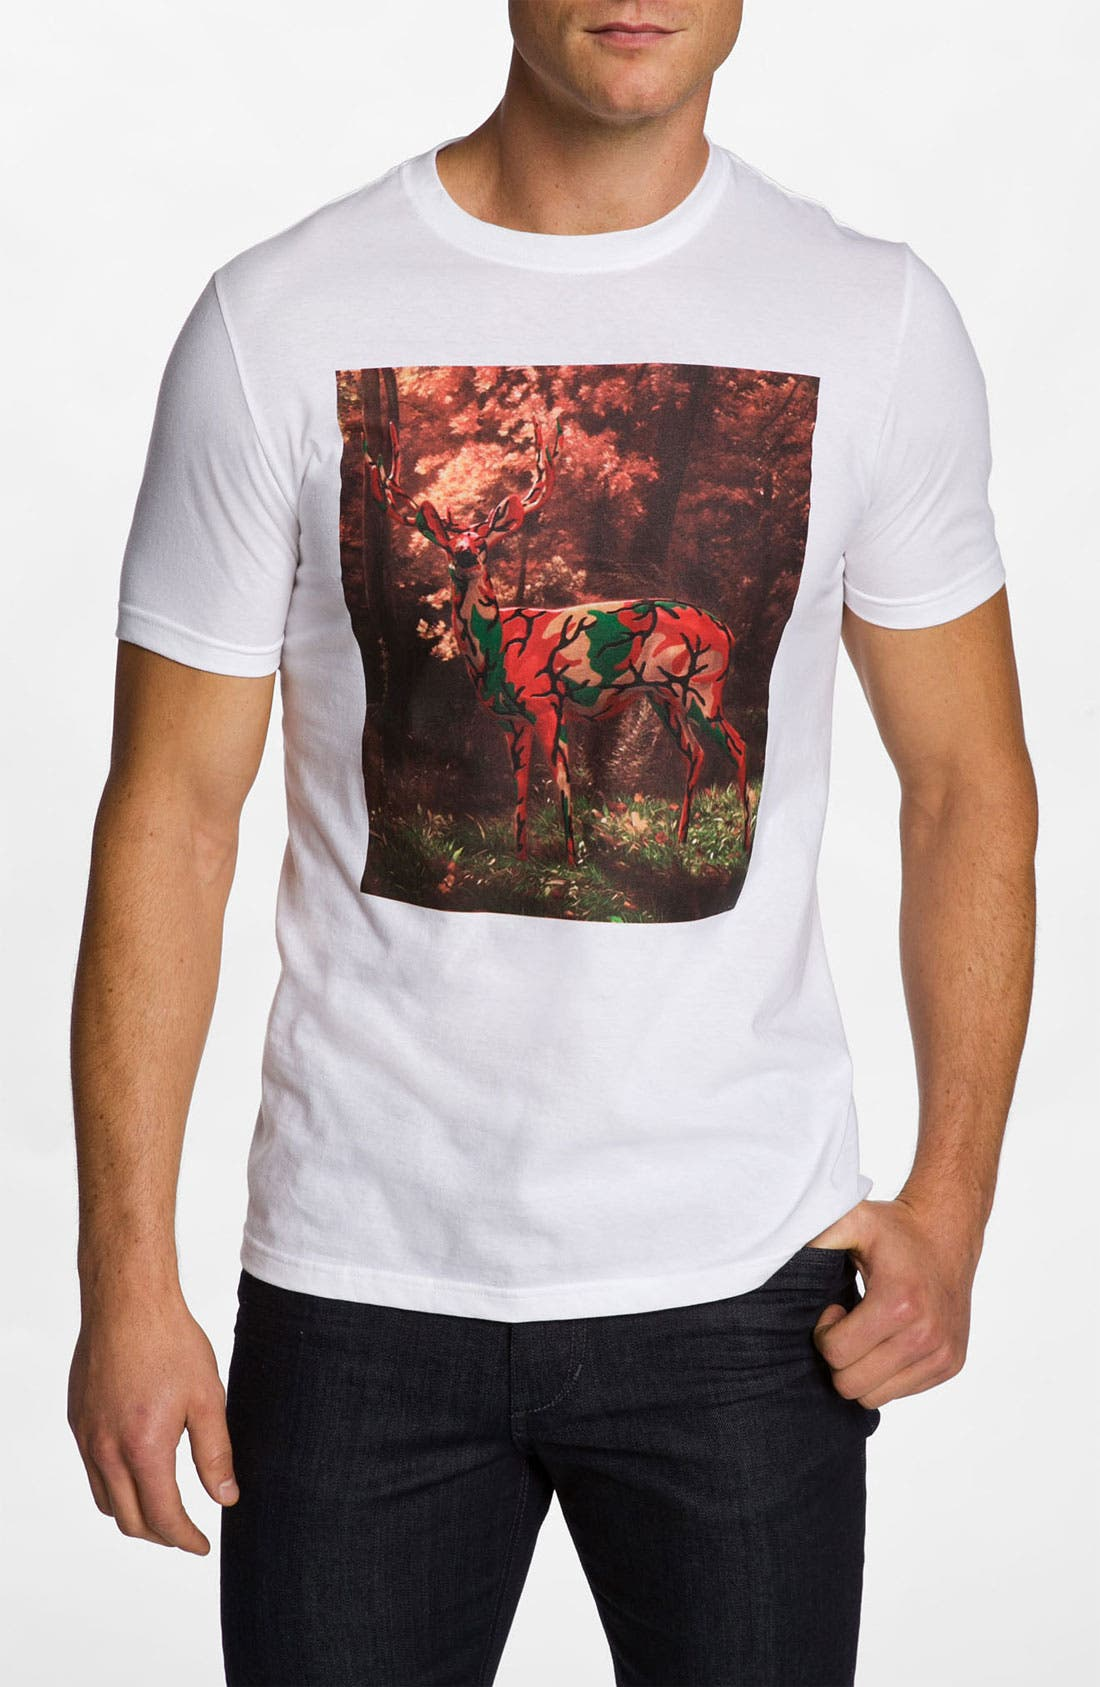 Main Image - Hurley 'Camo Deer' Graphic T-Shirt